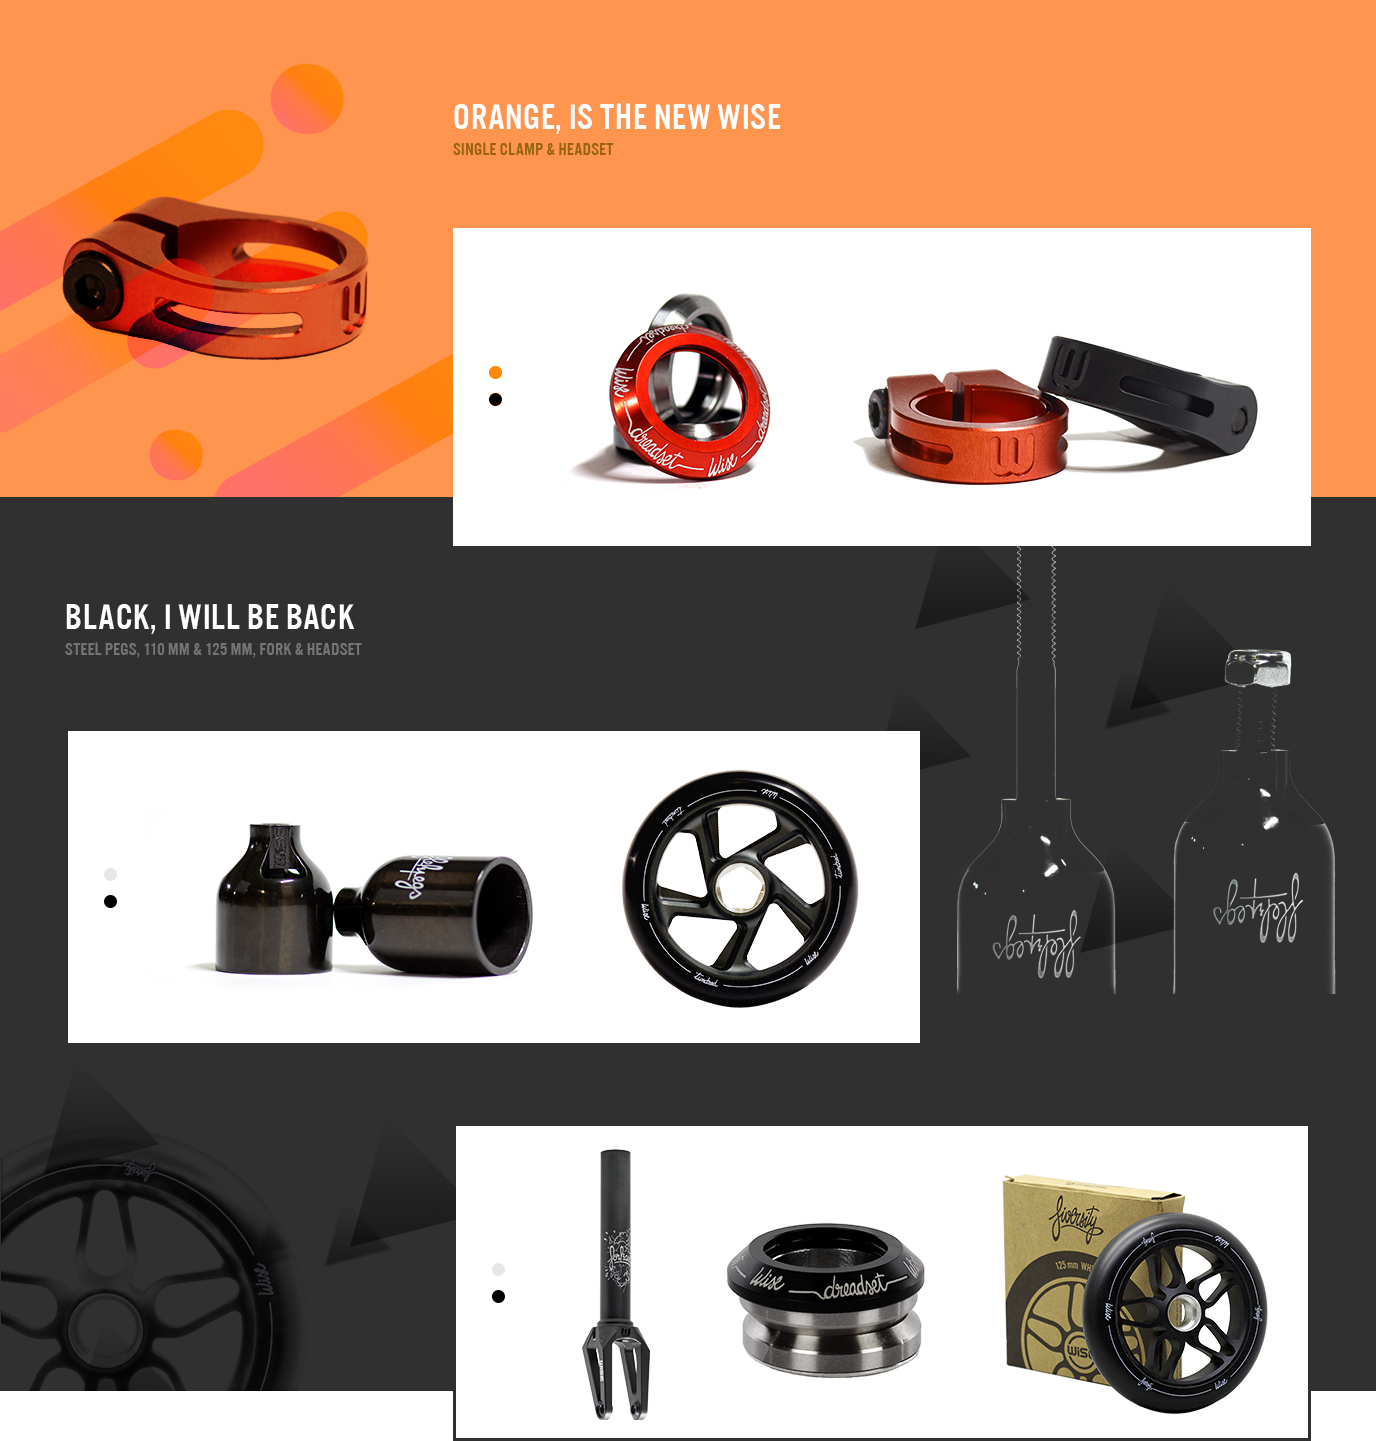 orange-black-color-wisescootering